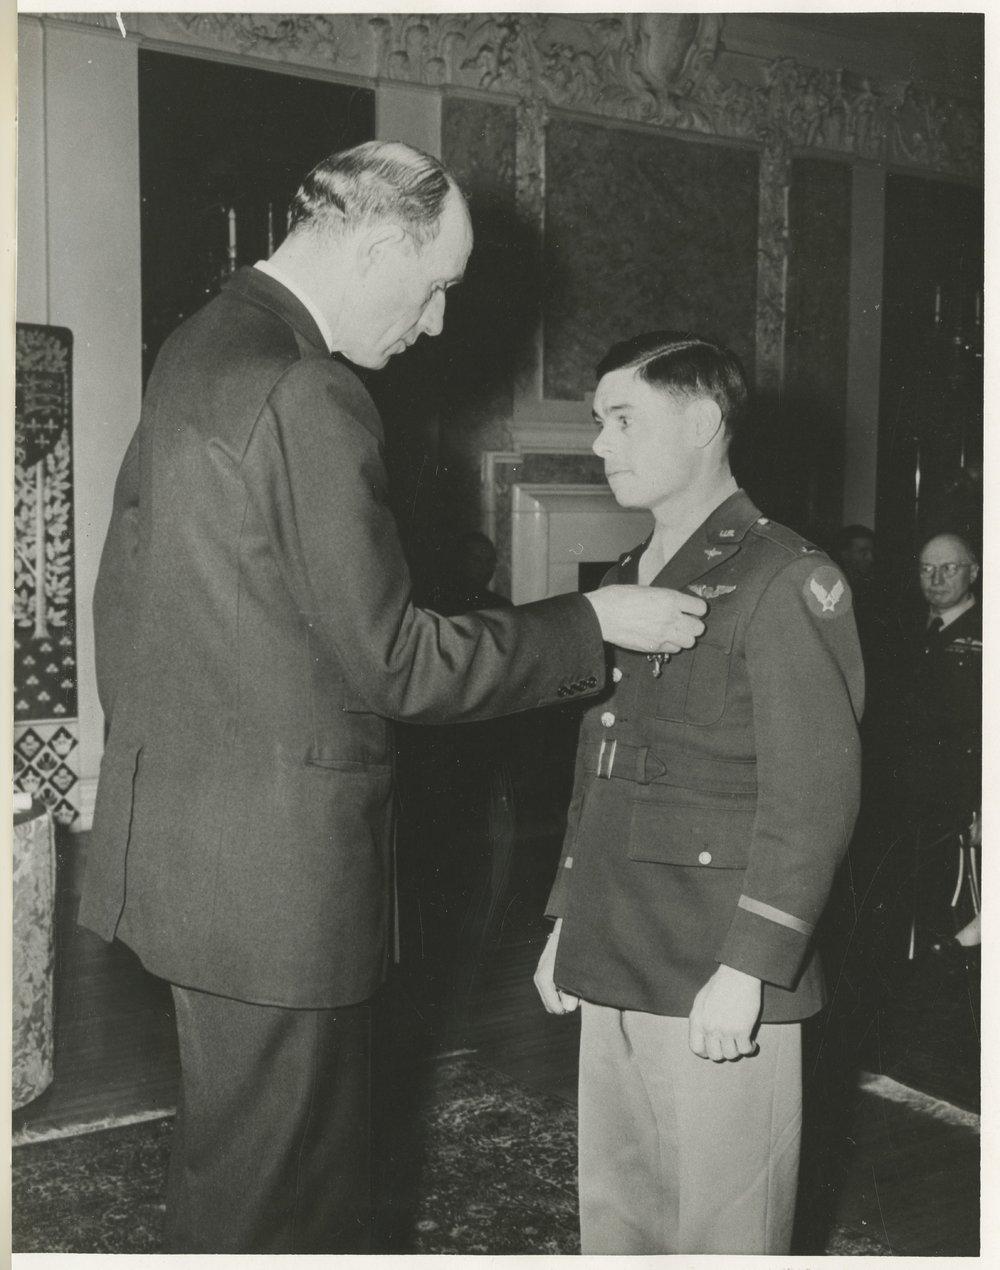 Robert S. Raymond receiving the British Distinguished Flying Cross